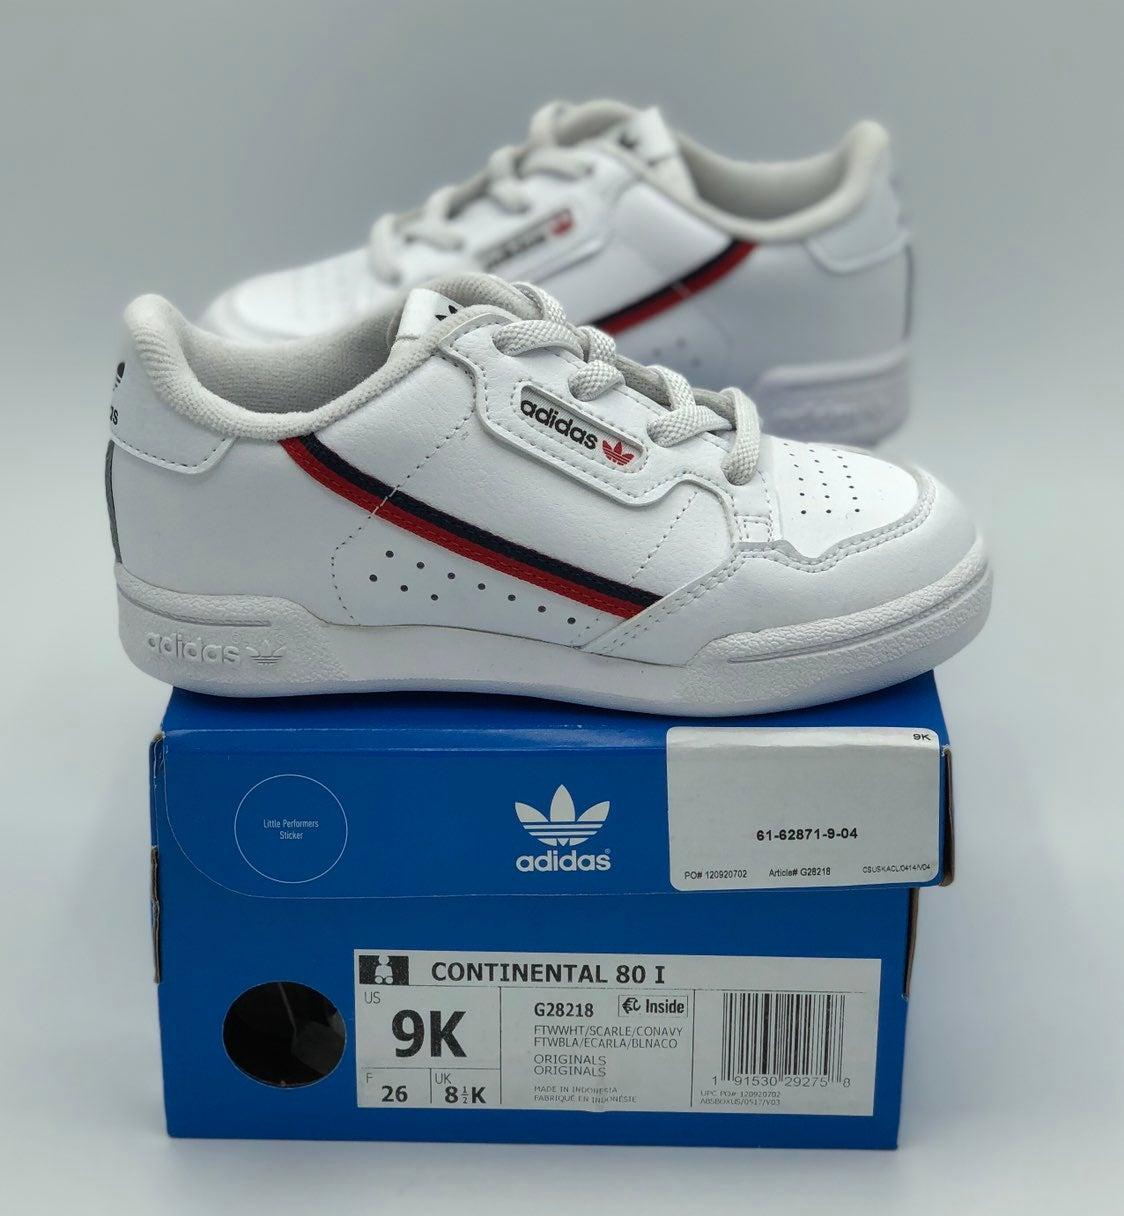 Adidas Continental 80 Toddler Kids